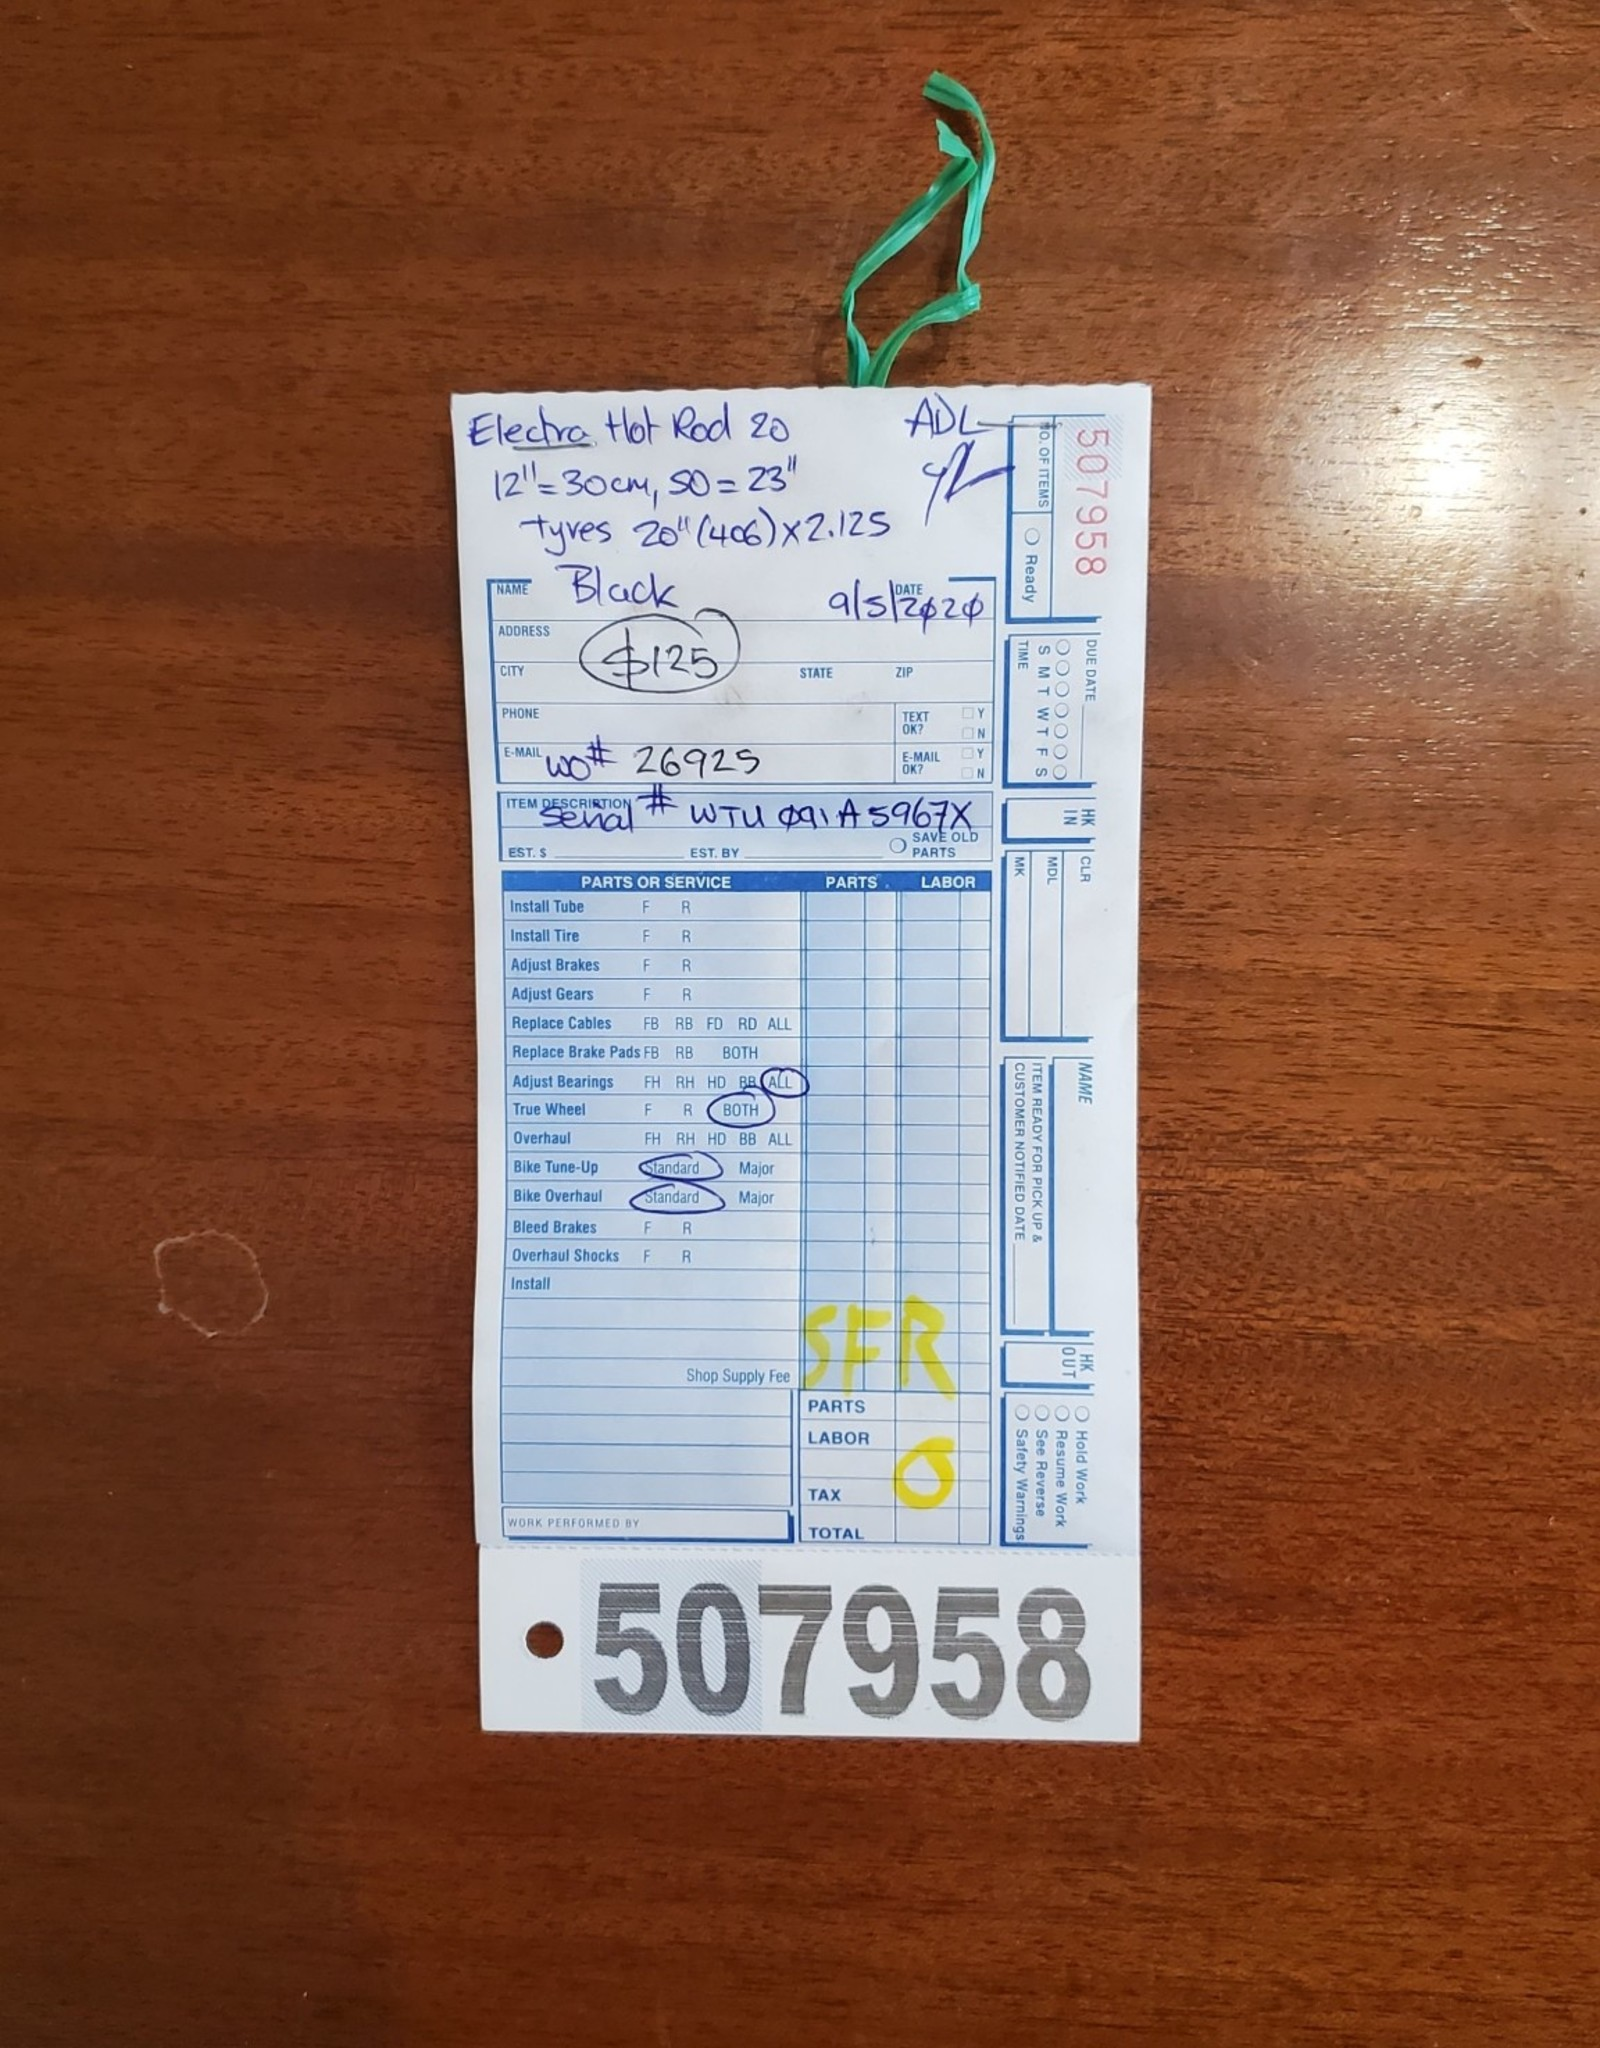 "20"" Electra Hot Rod (967X SFR)"